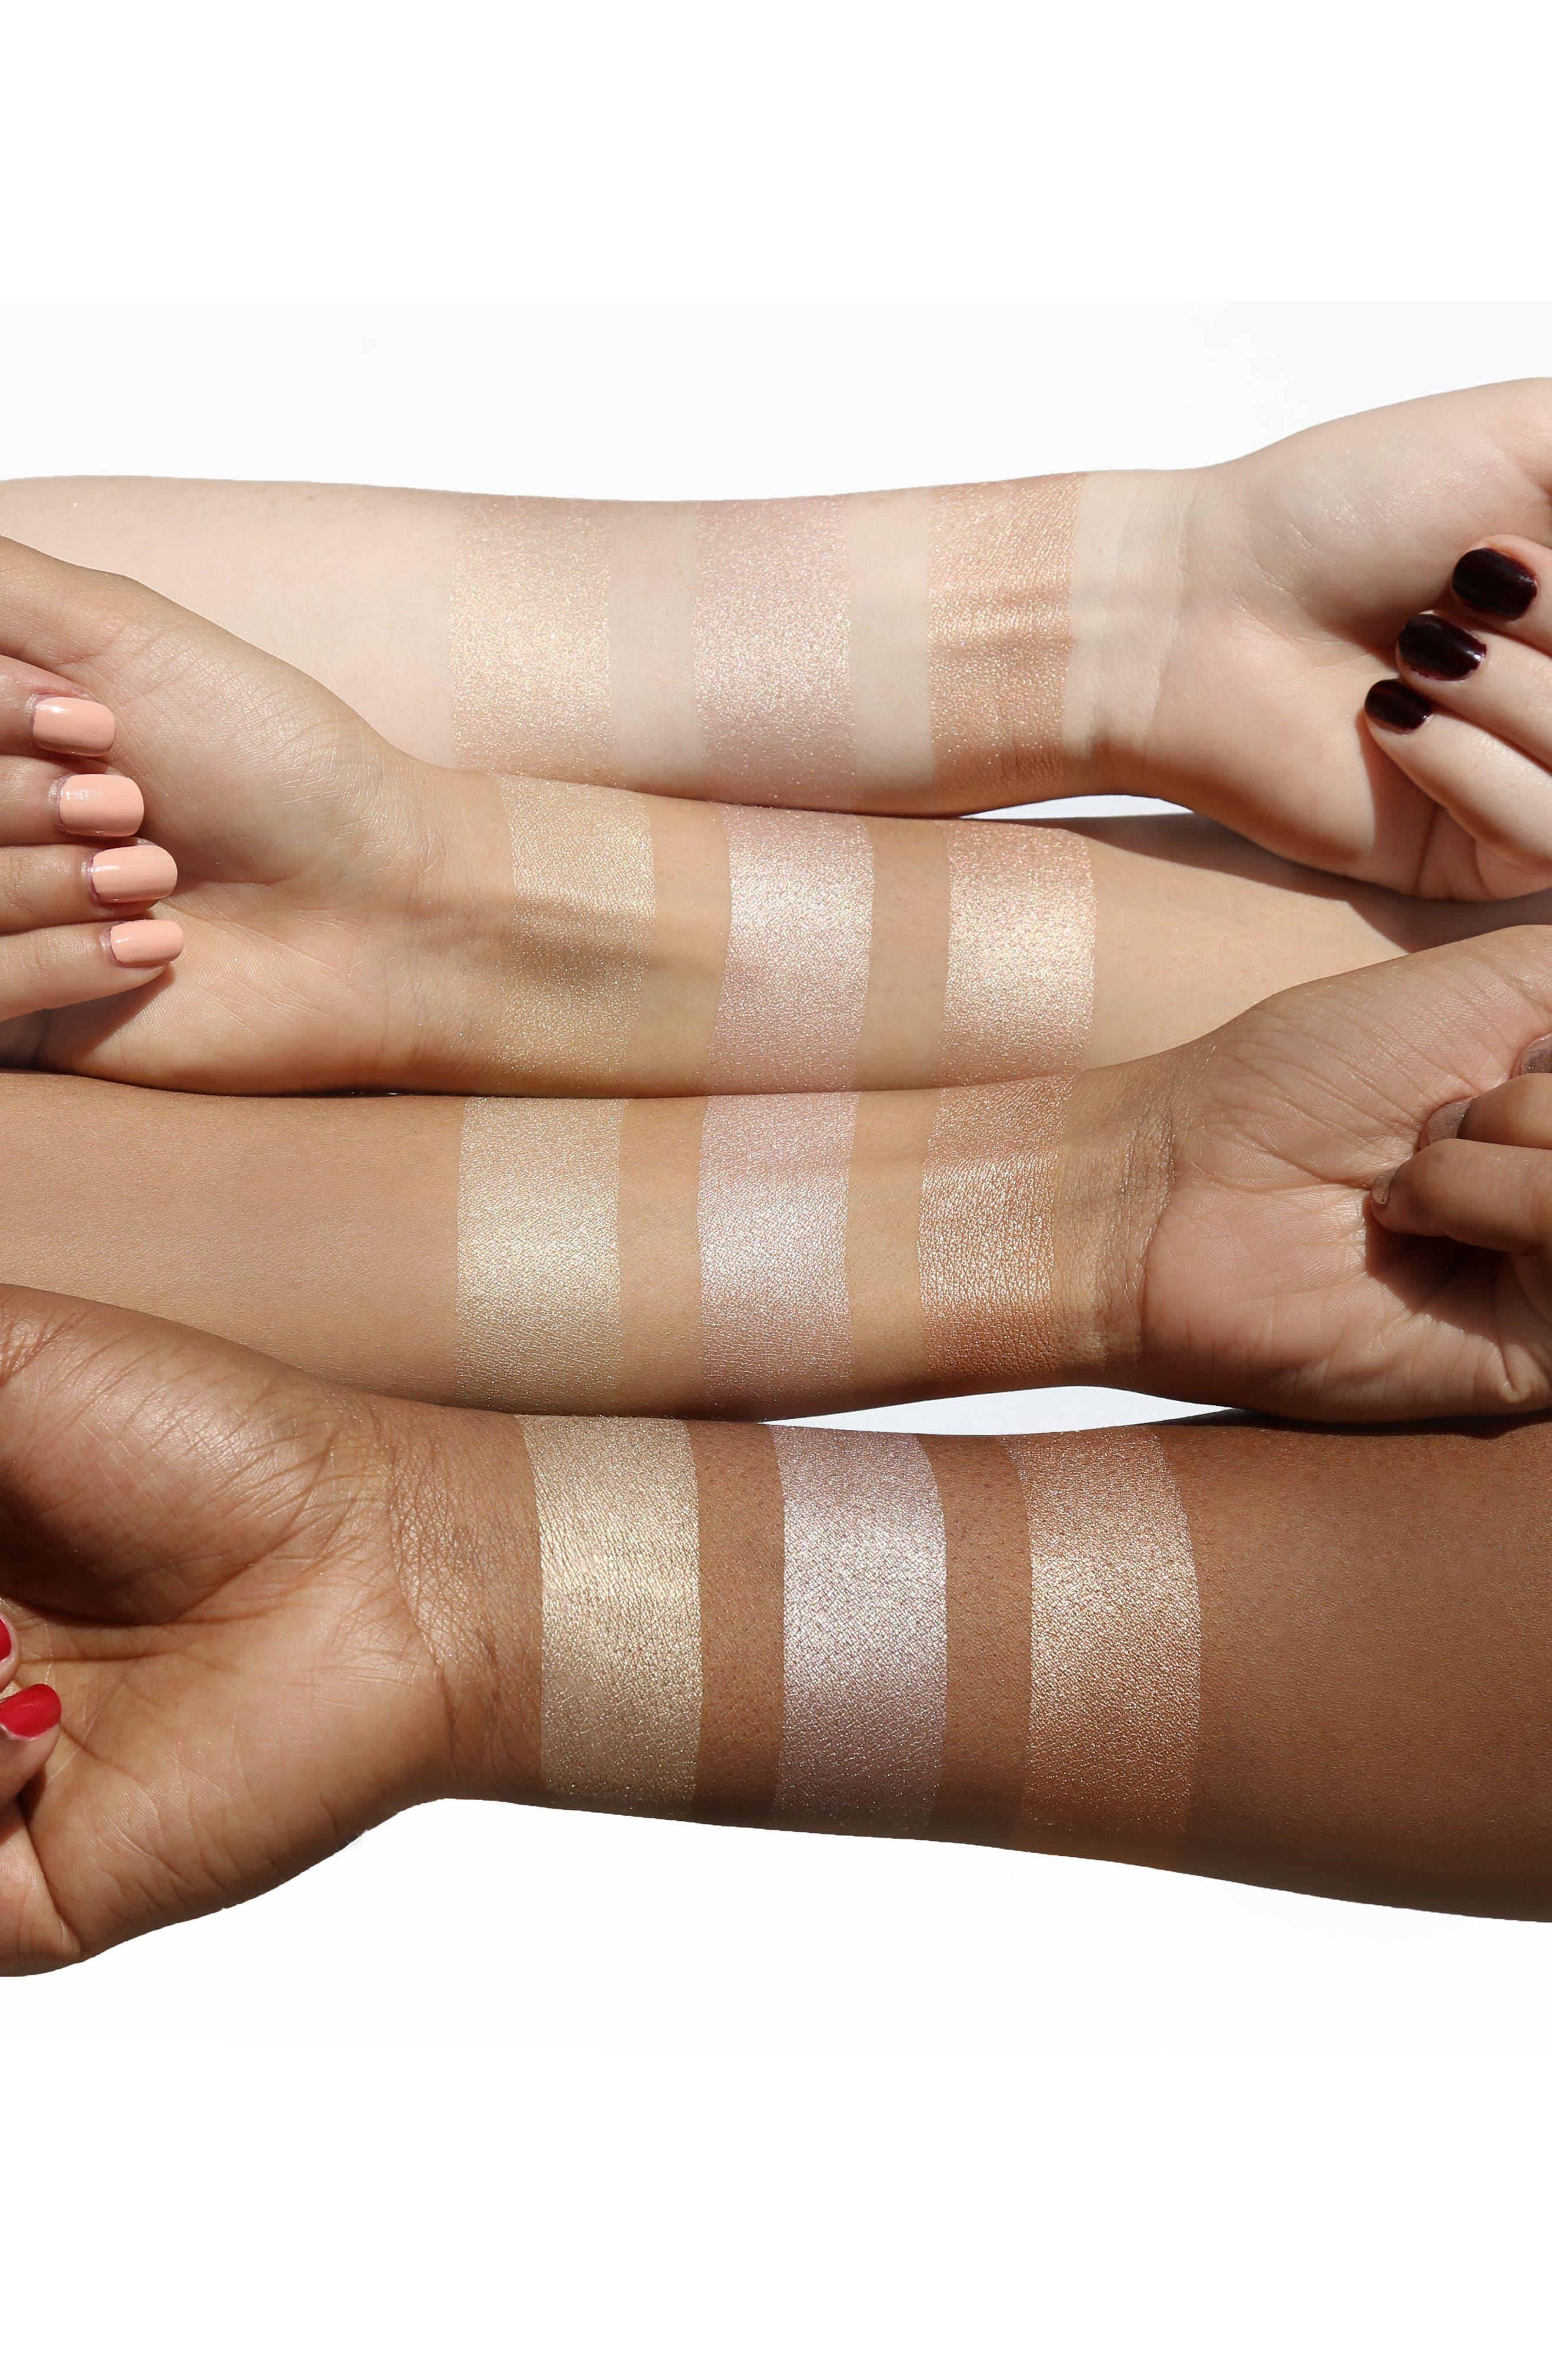 Skinny Dip, Peach & Rose Gold Powder Highlighter Trio,                             Alternate thumbnail 4, color,                             000